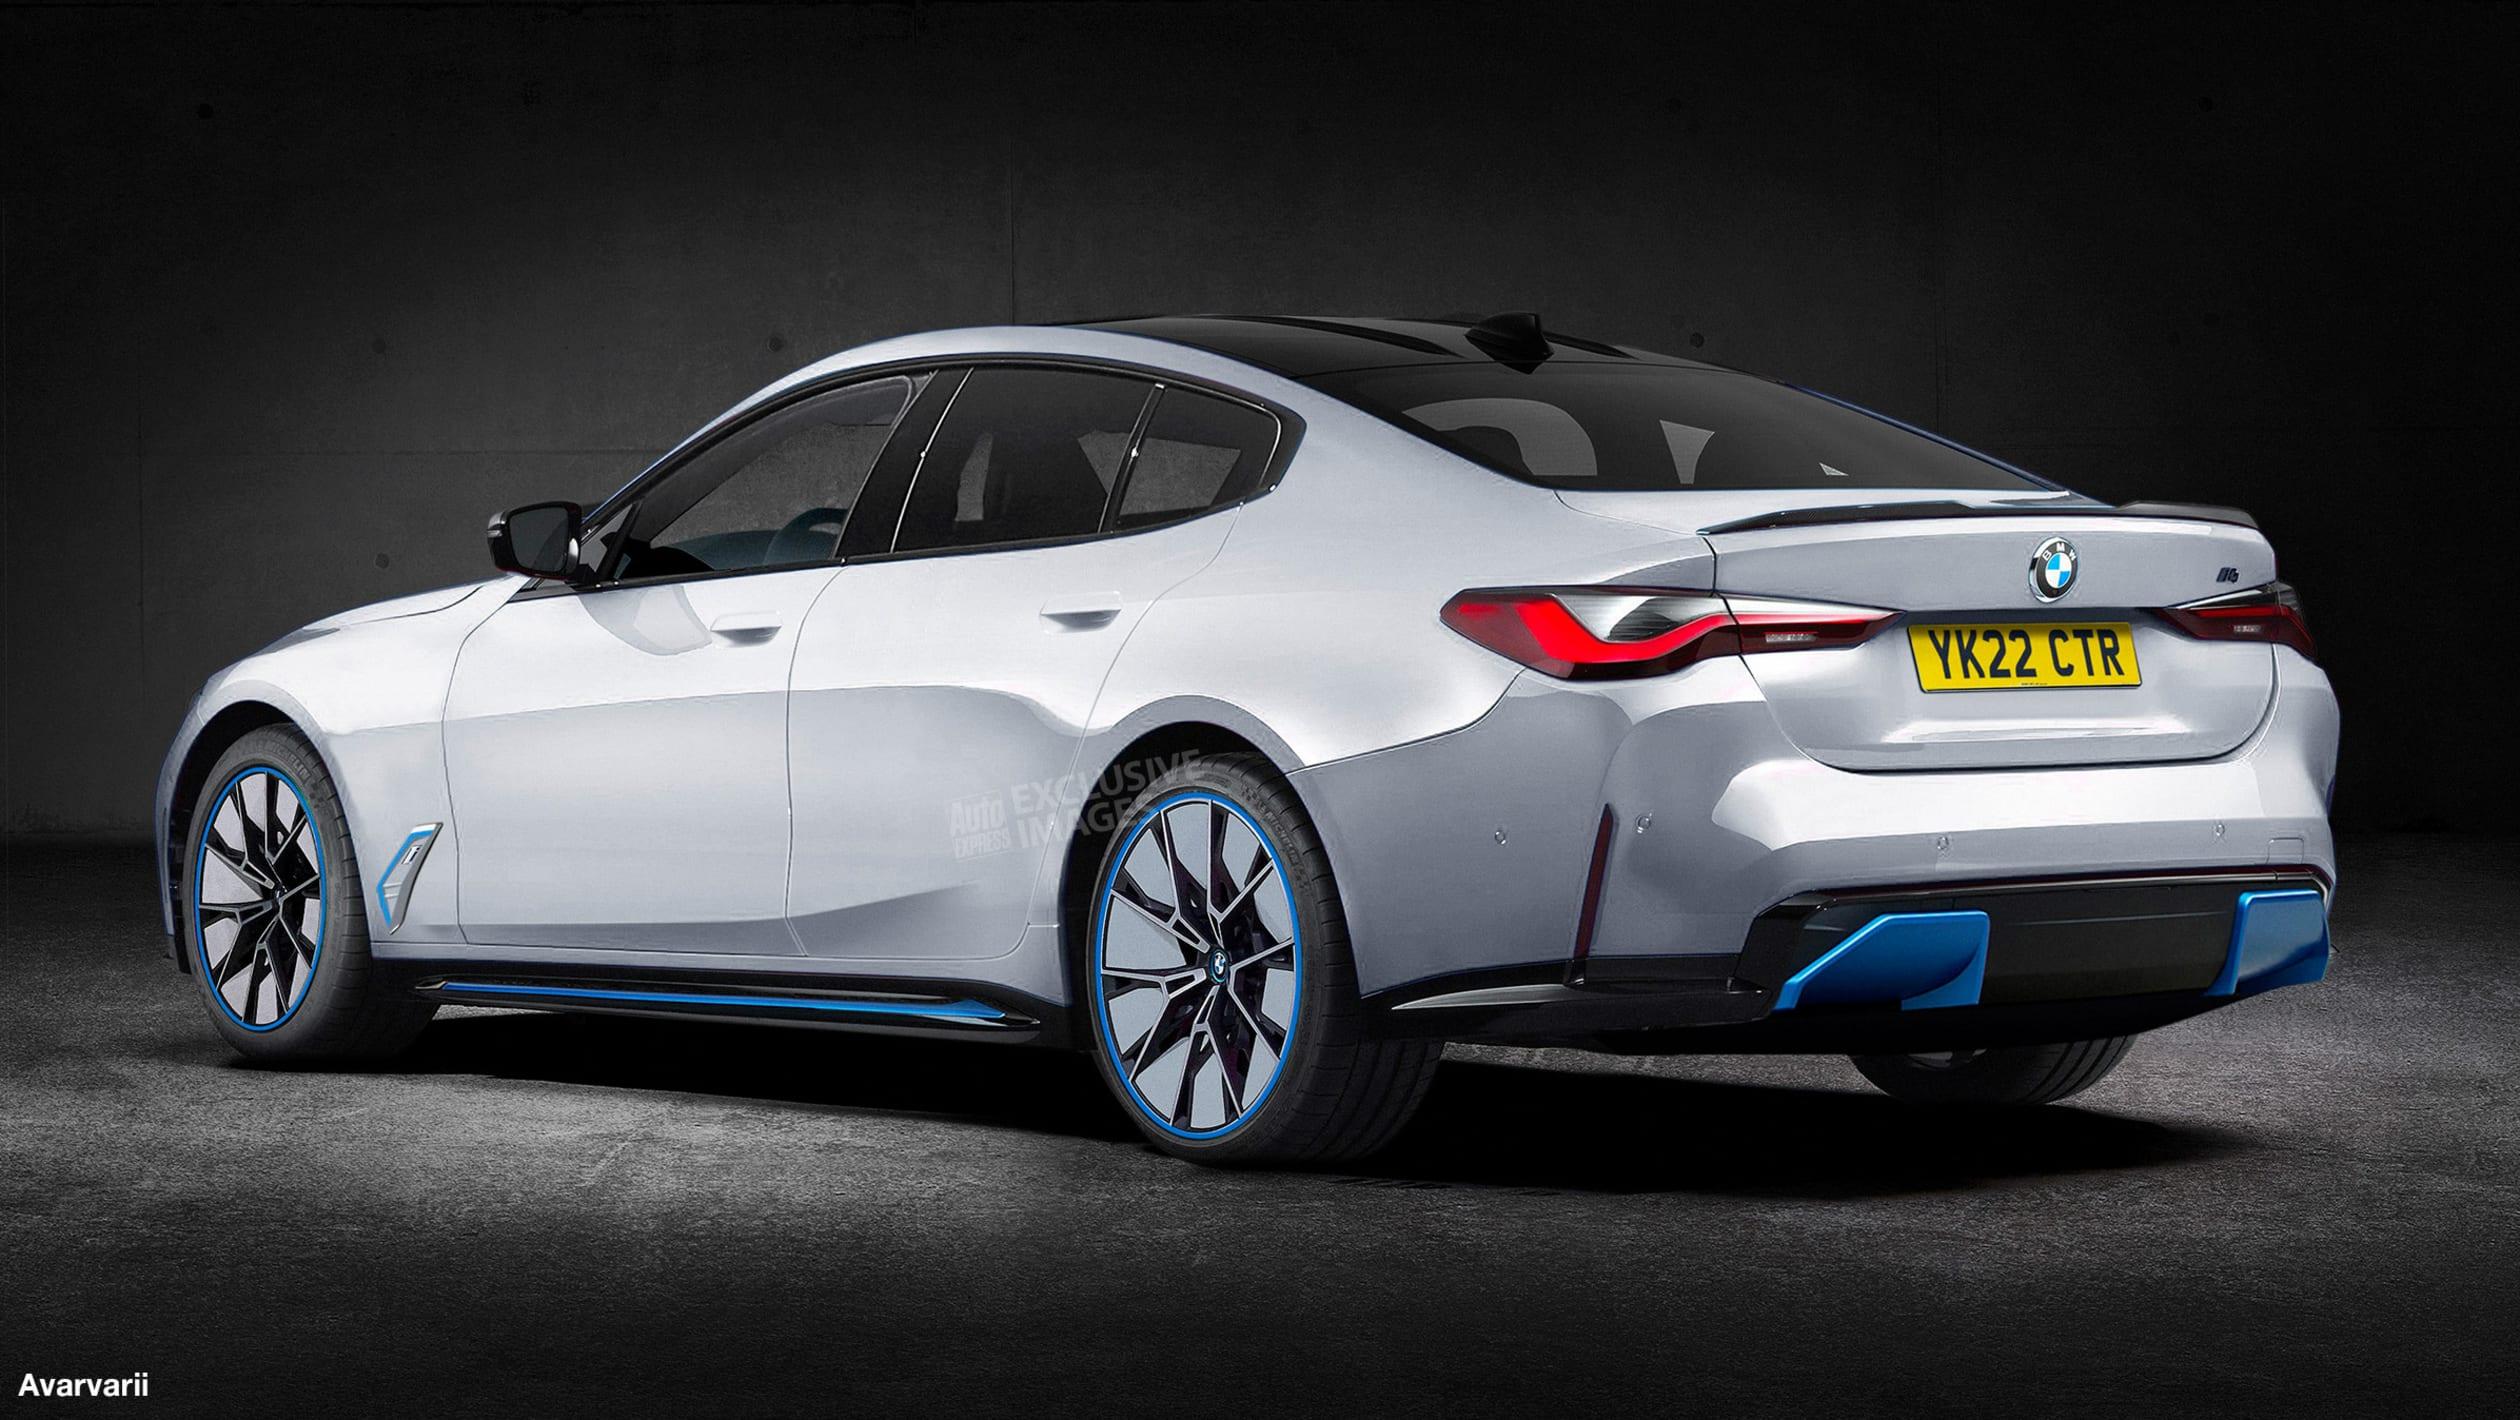 BMW%20i4%20exclusive%20images-2.jpg